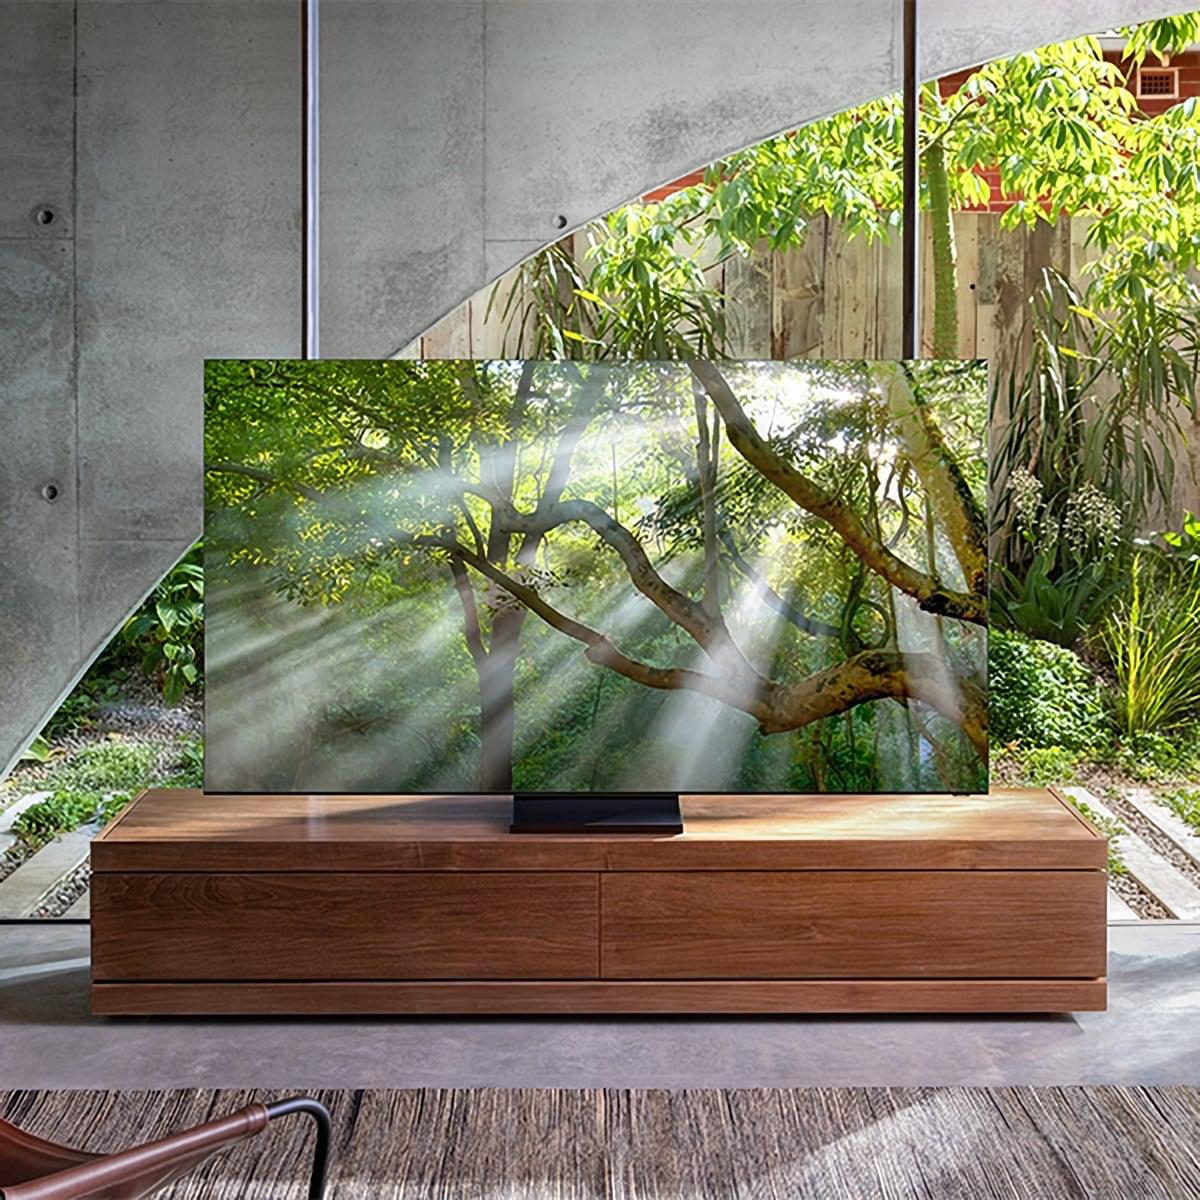 Samsung QLED 2020 2